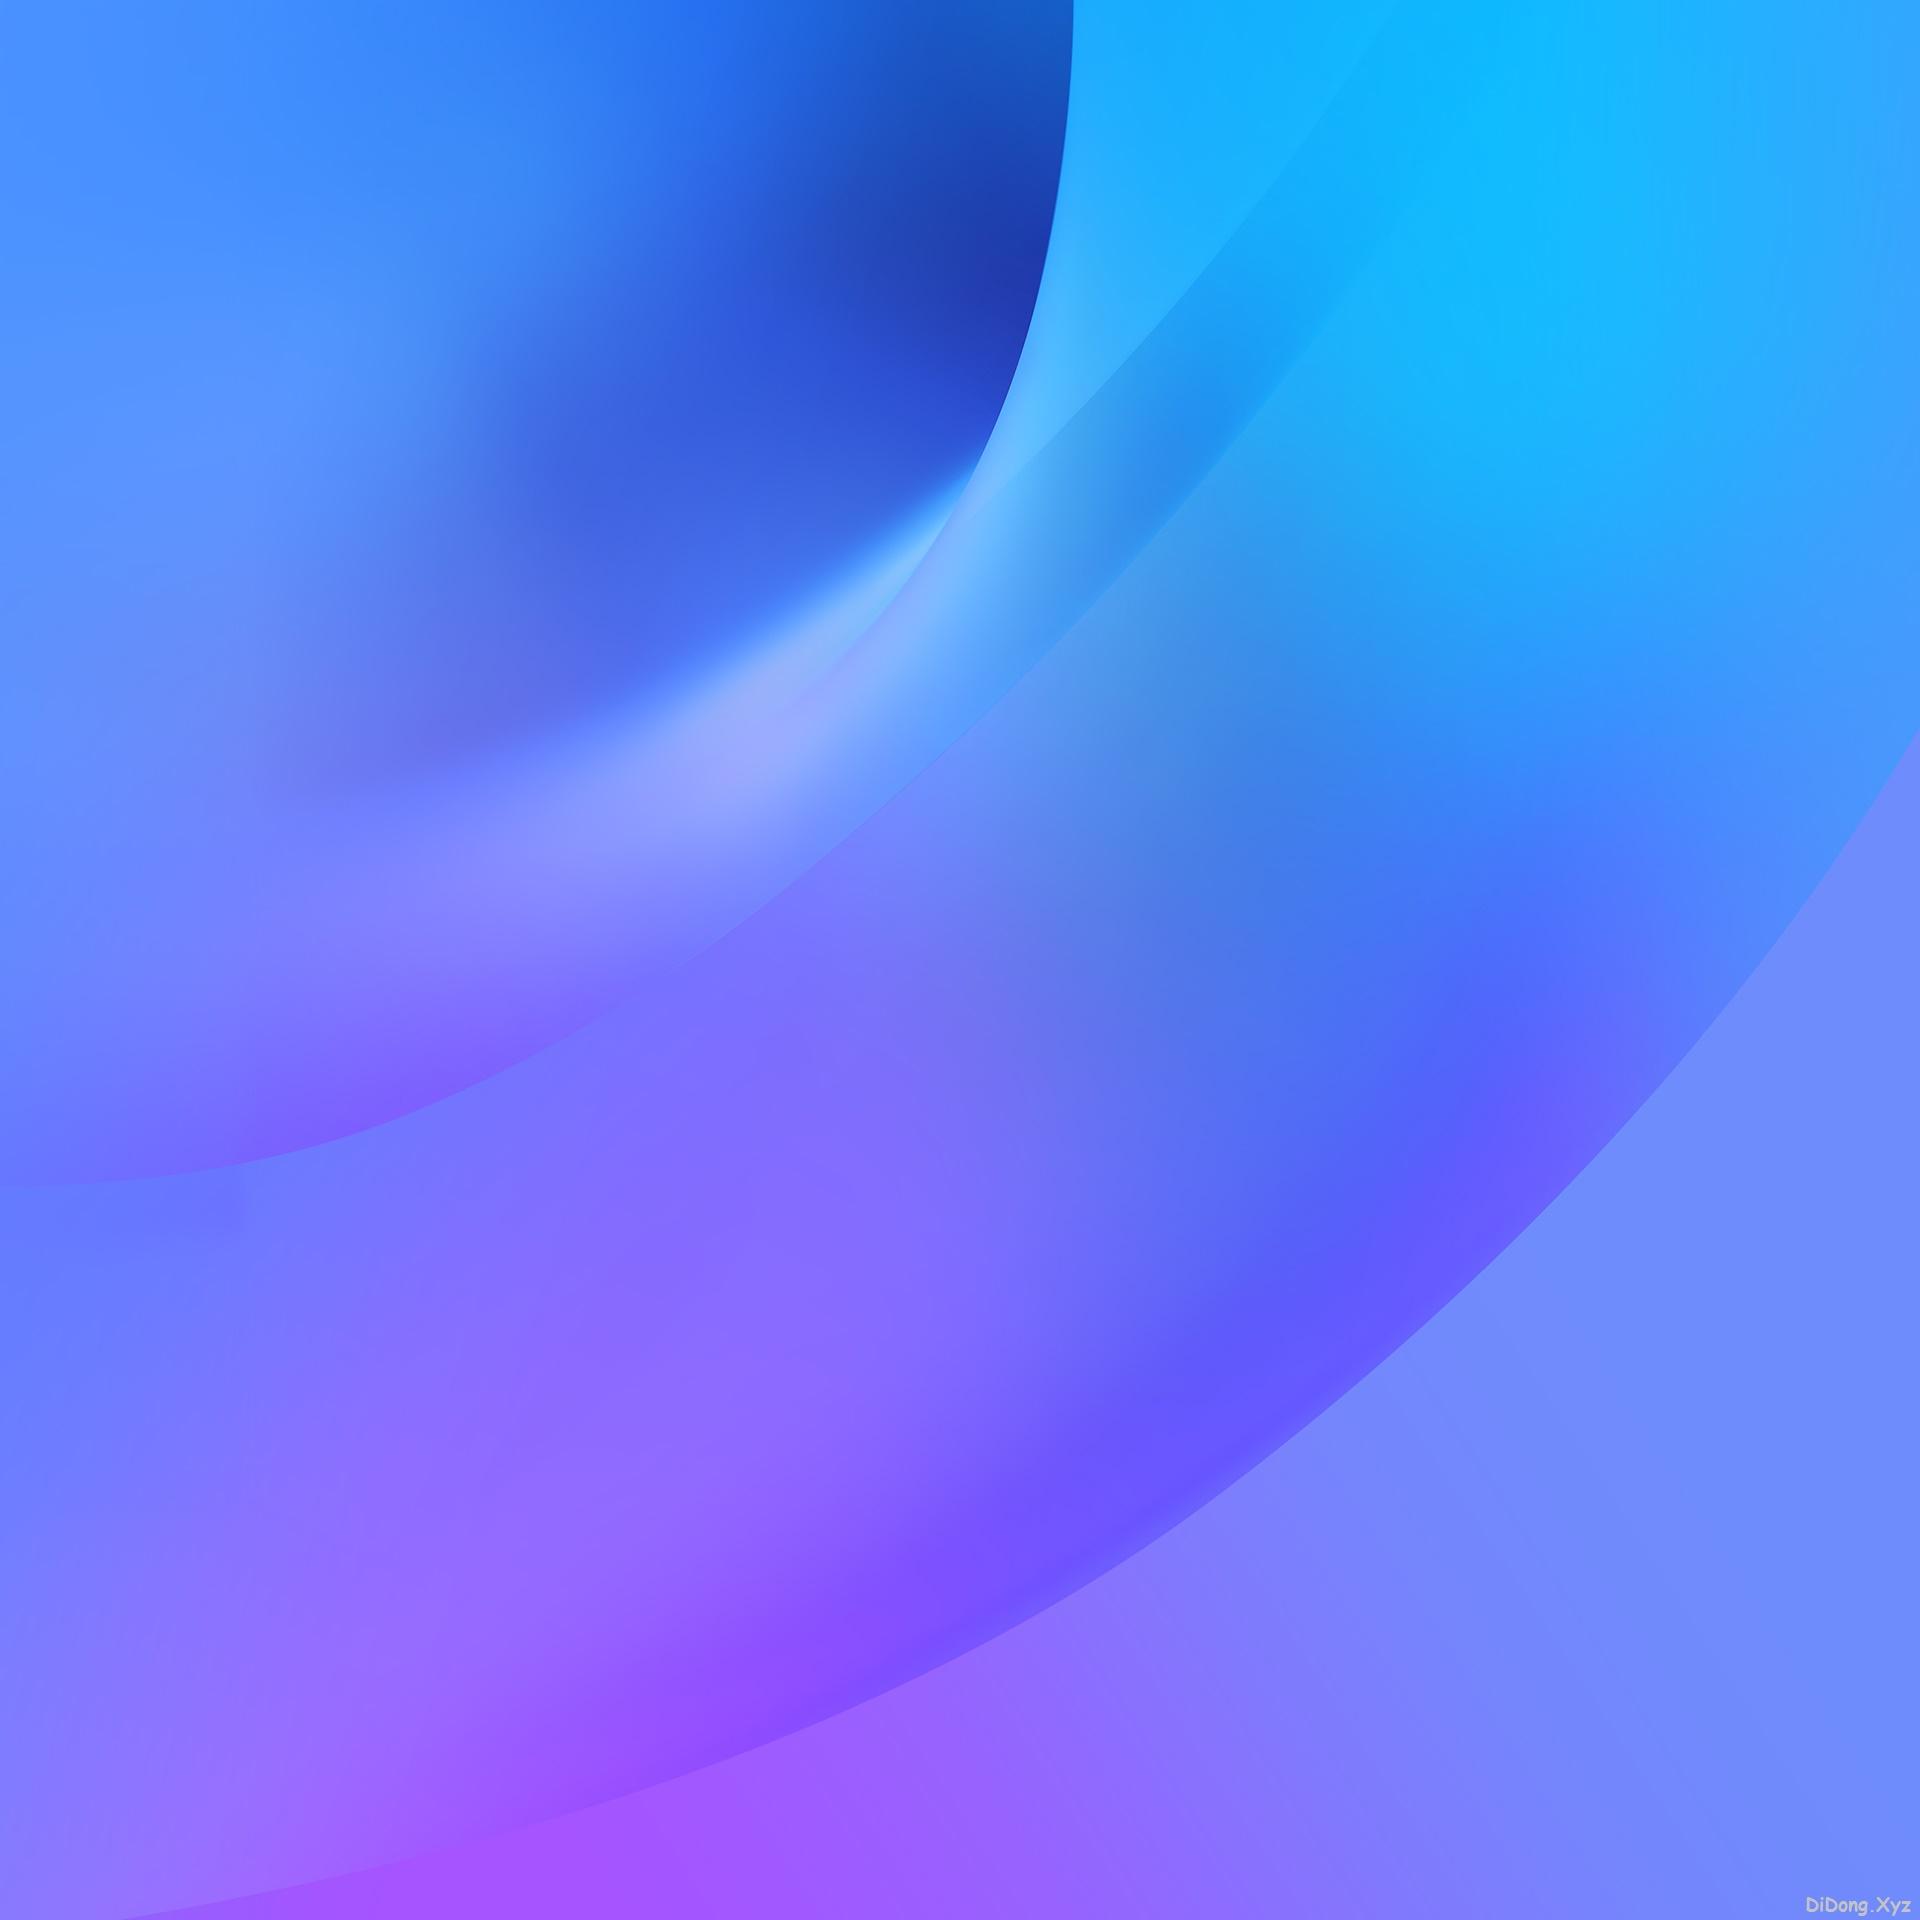 hinh nen samsung galaxy j7 2016